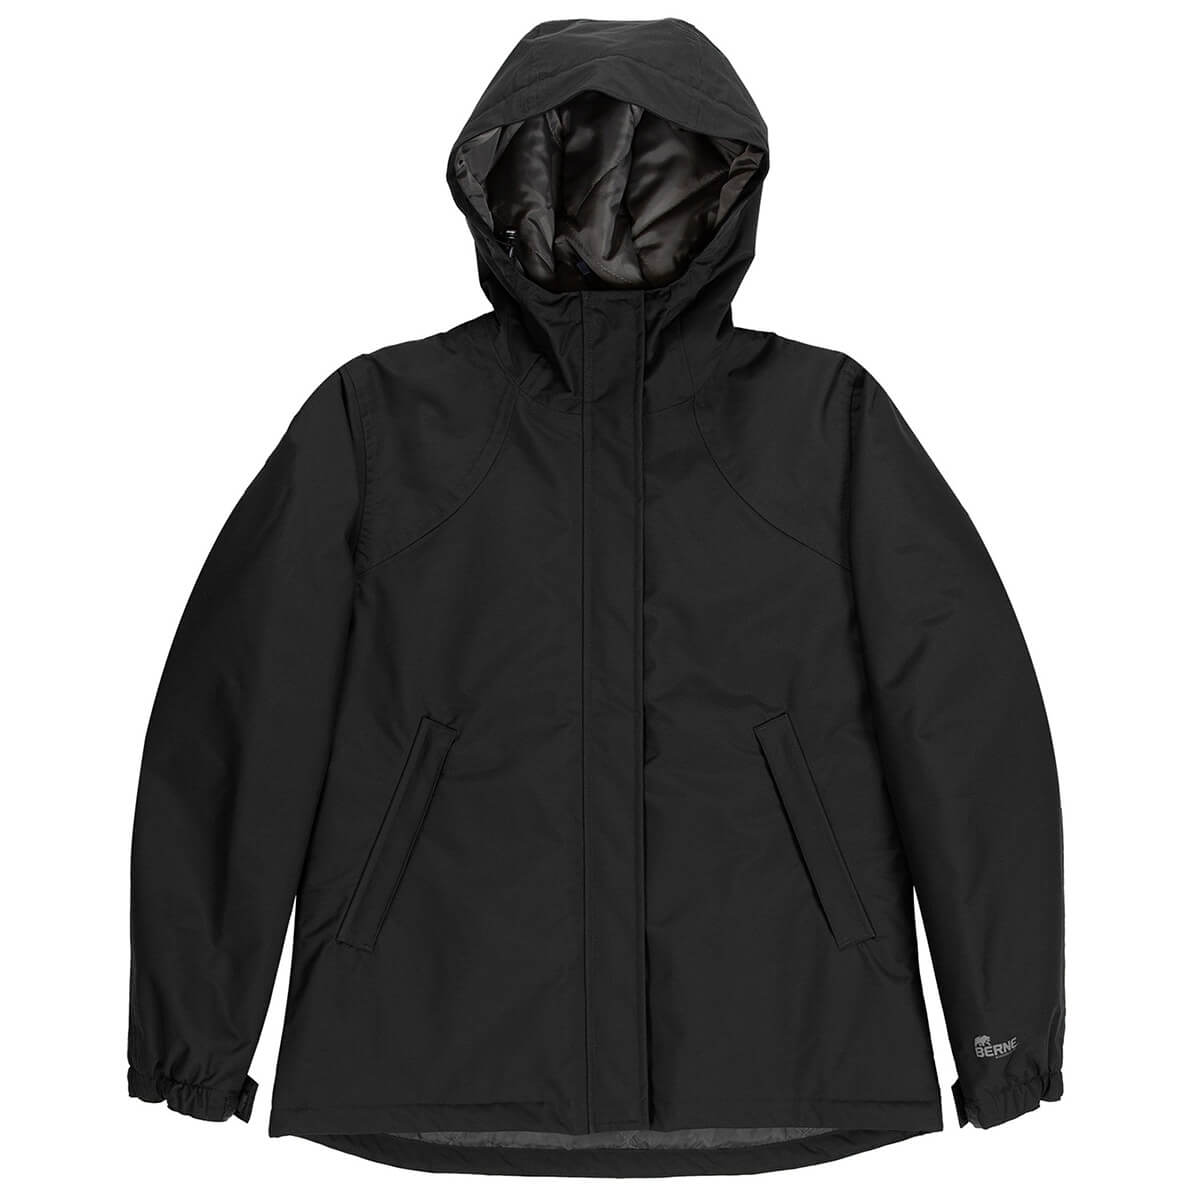 Women's Coastline Waterproof Storm Jacket - Black